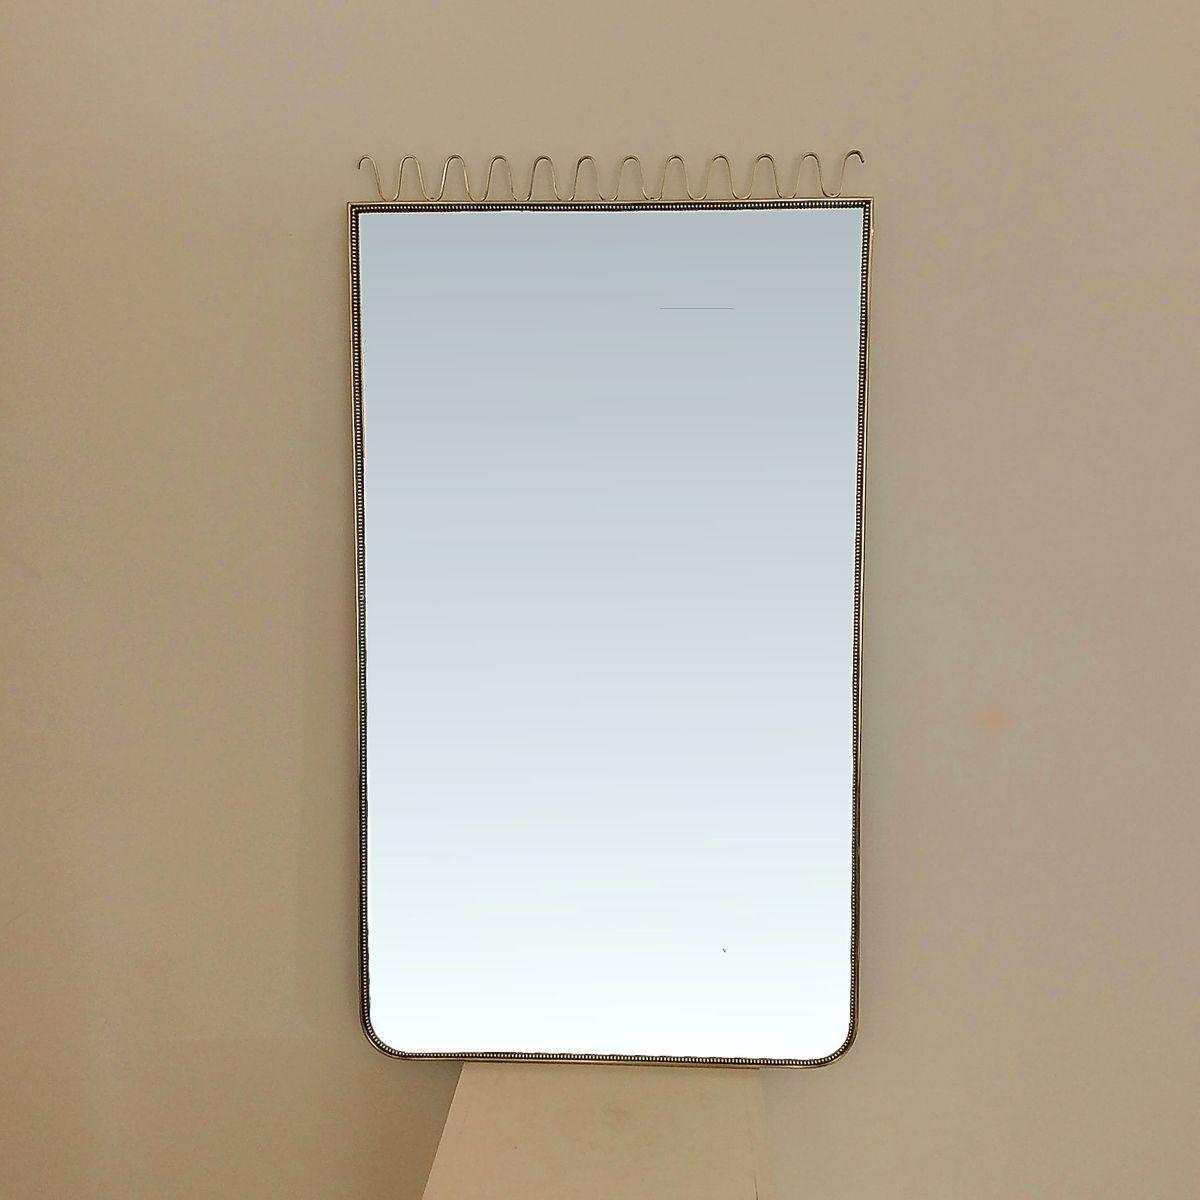 Miroir encadr en laiton italie 1950s en vente sur pamono for Miroir laiton